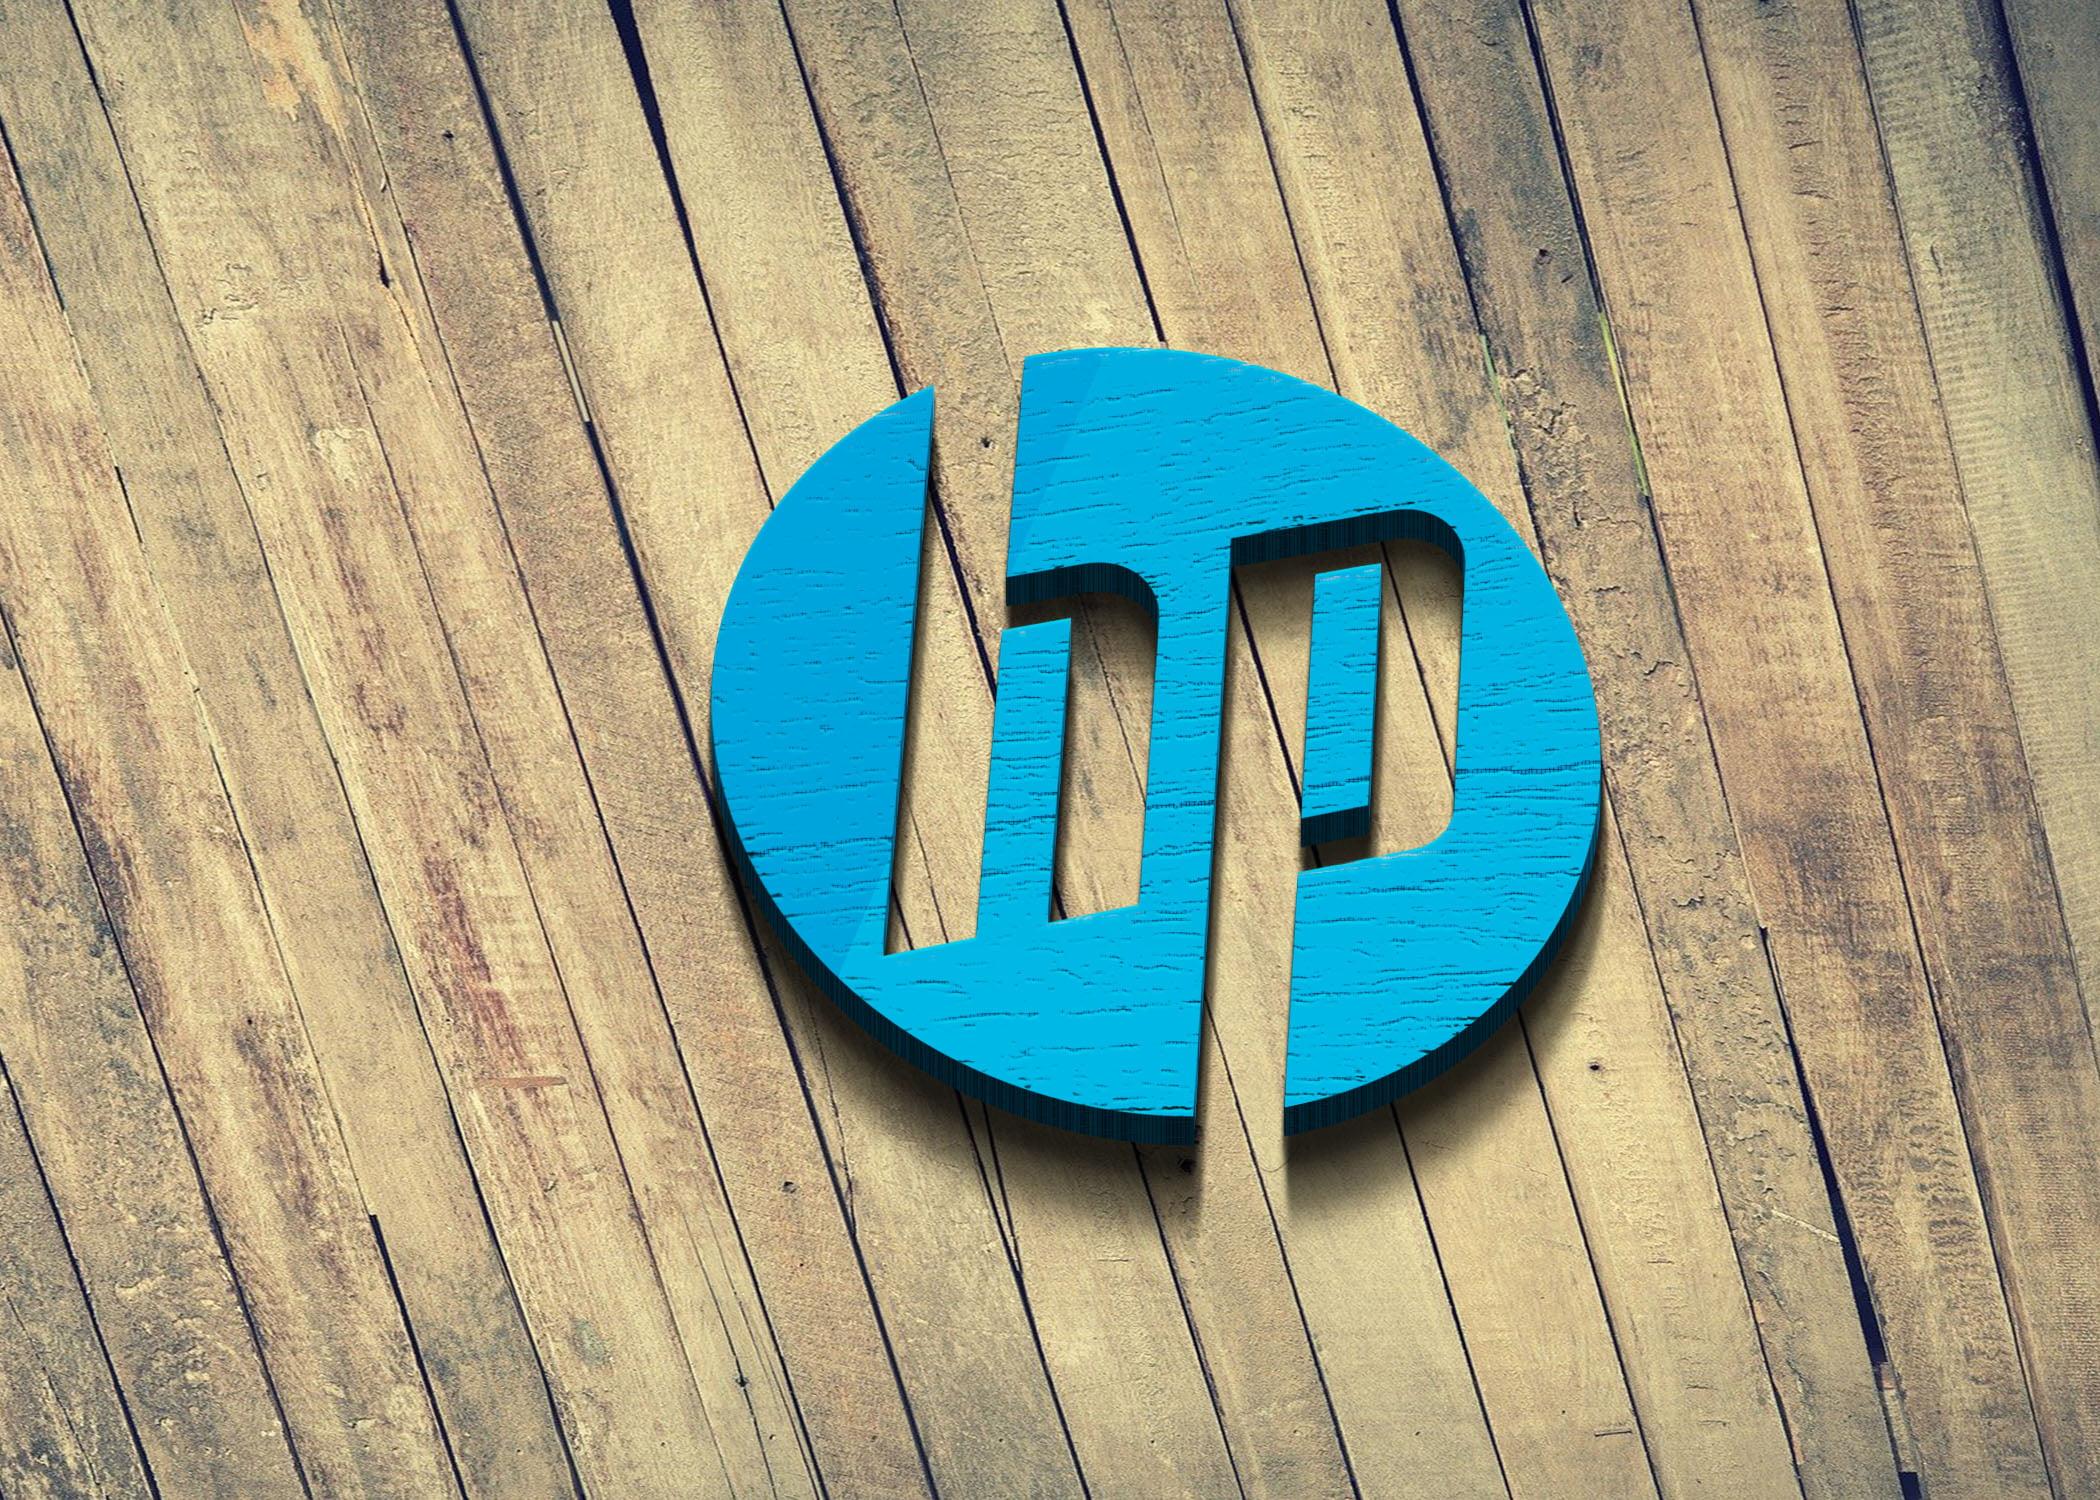 HP logo on wood mockup